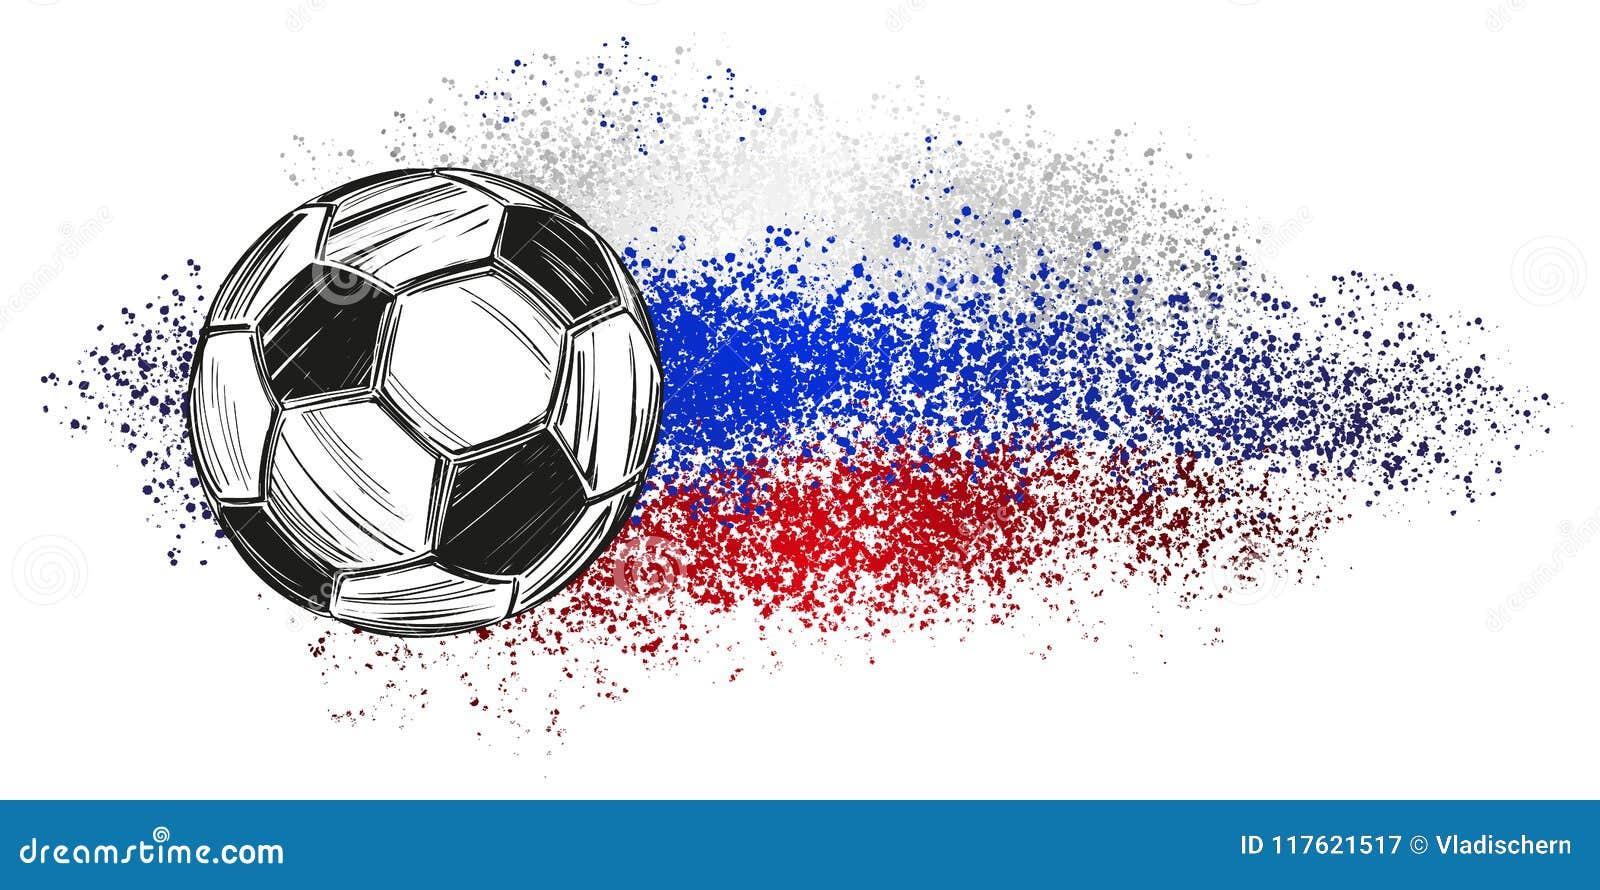 Fussball Fussball Russisches Flaggensportspiel